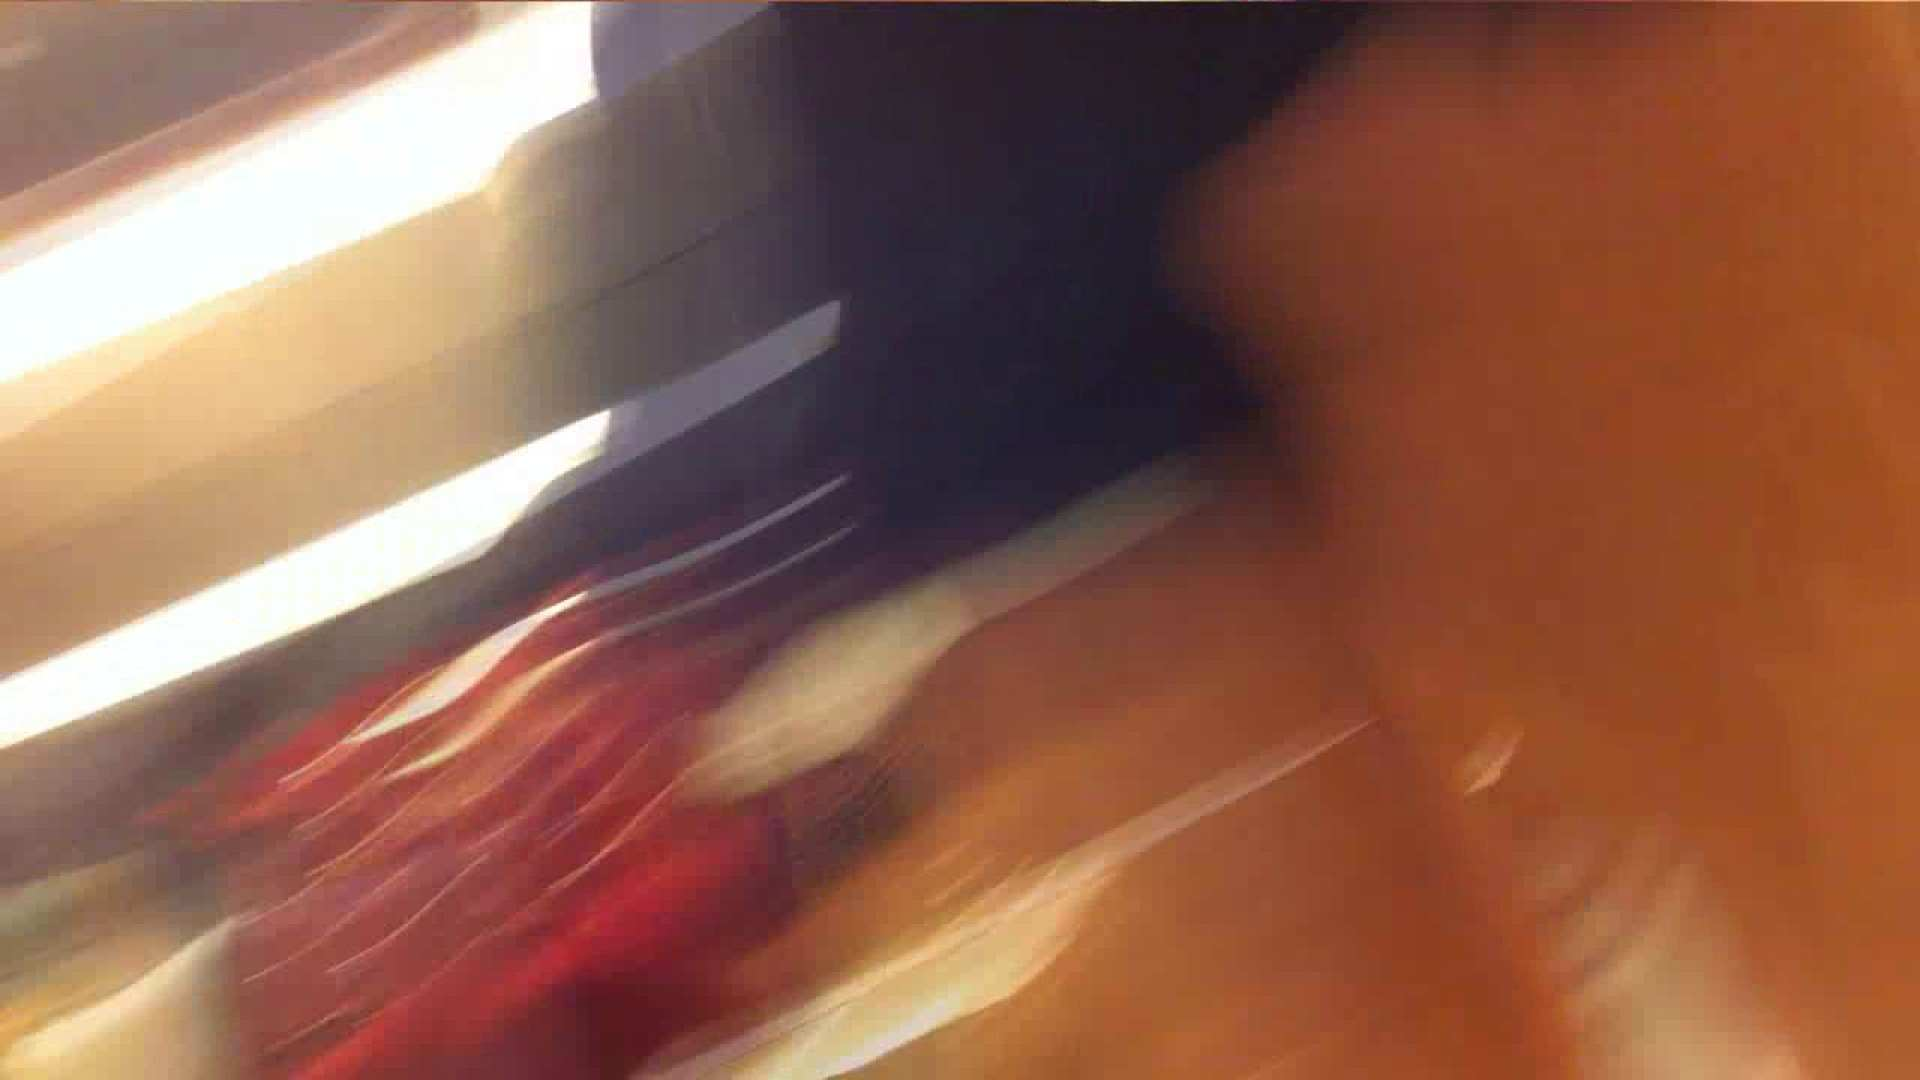 vol.33 美人アパレル胸チラ&パンチラ ギャル系ネーチャンの下着 接写 おまんこ動画流出 92pic 39